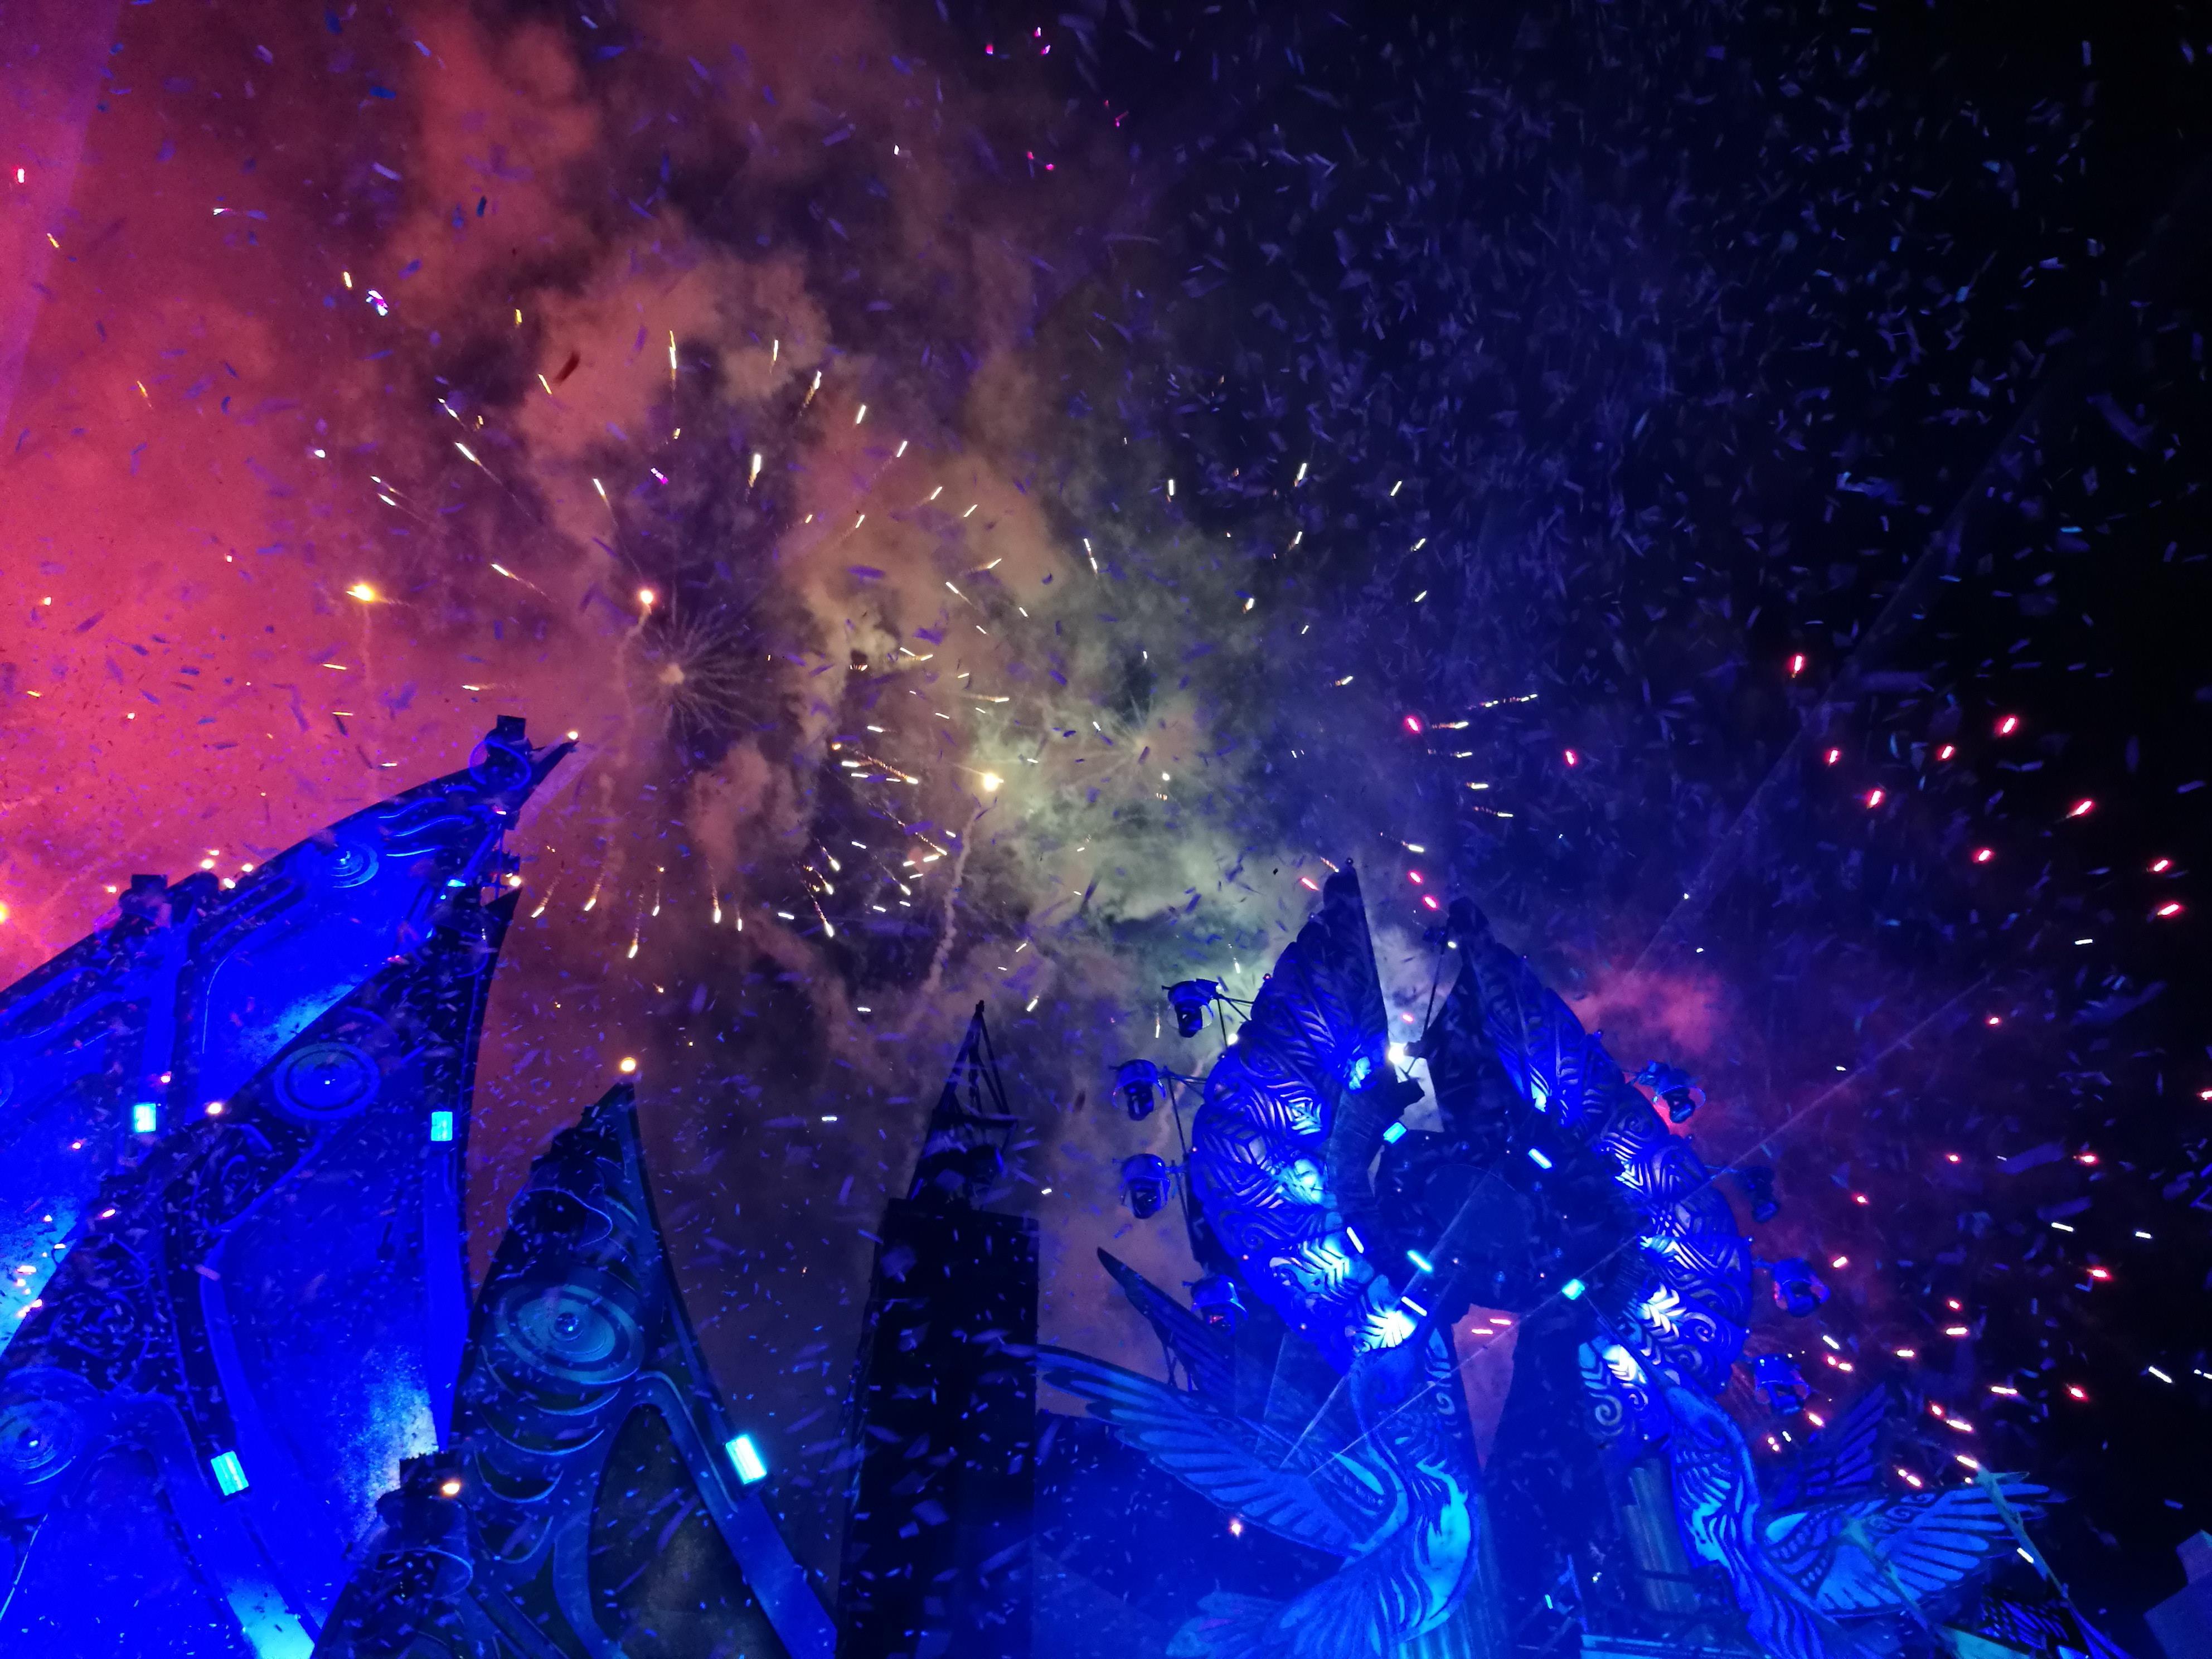 Fuochi d'artificio finali al Mysteryland